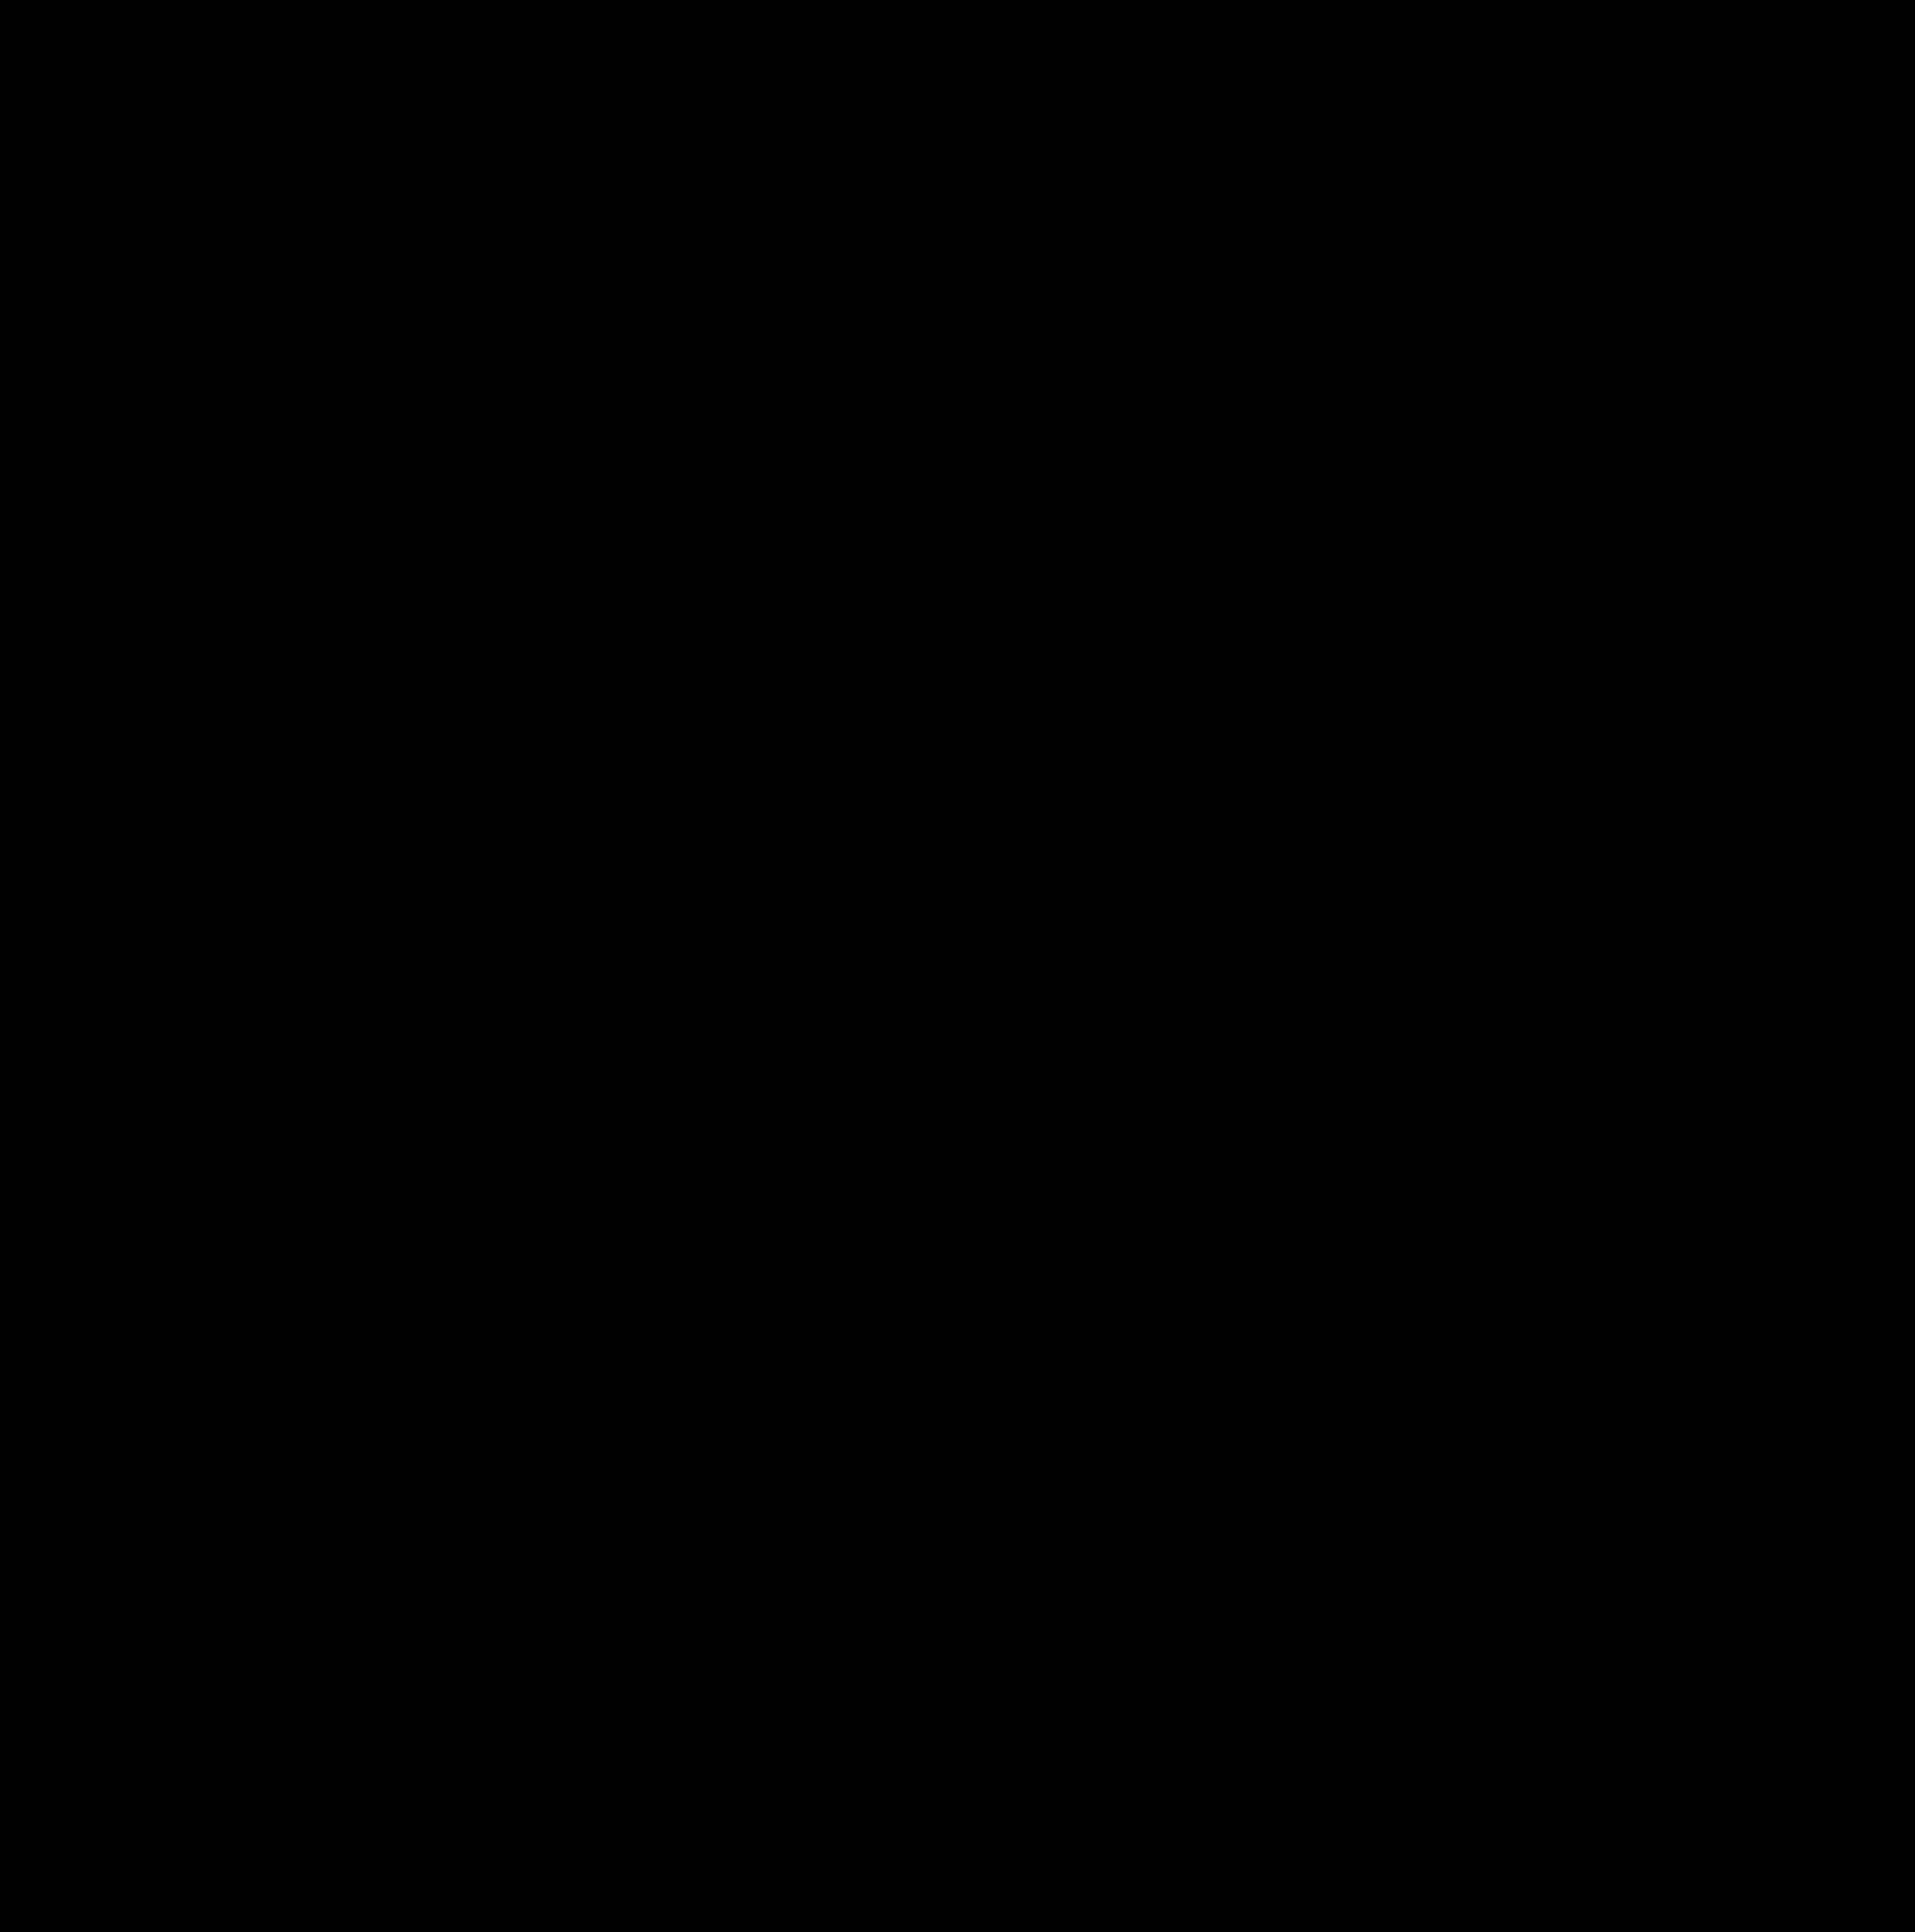 II VESPERAS IN NAVITATE DOMINI. Antifonario de Tempore s.XV